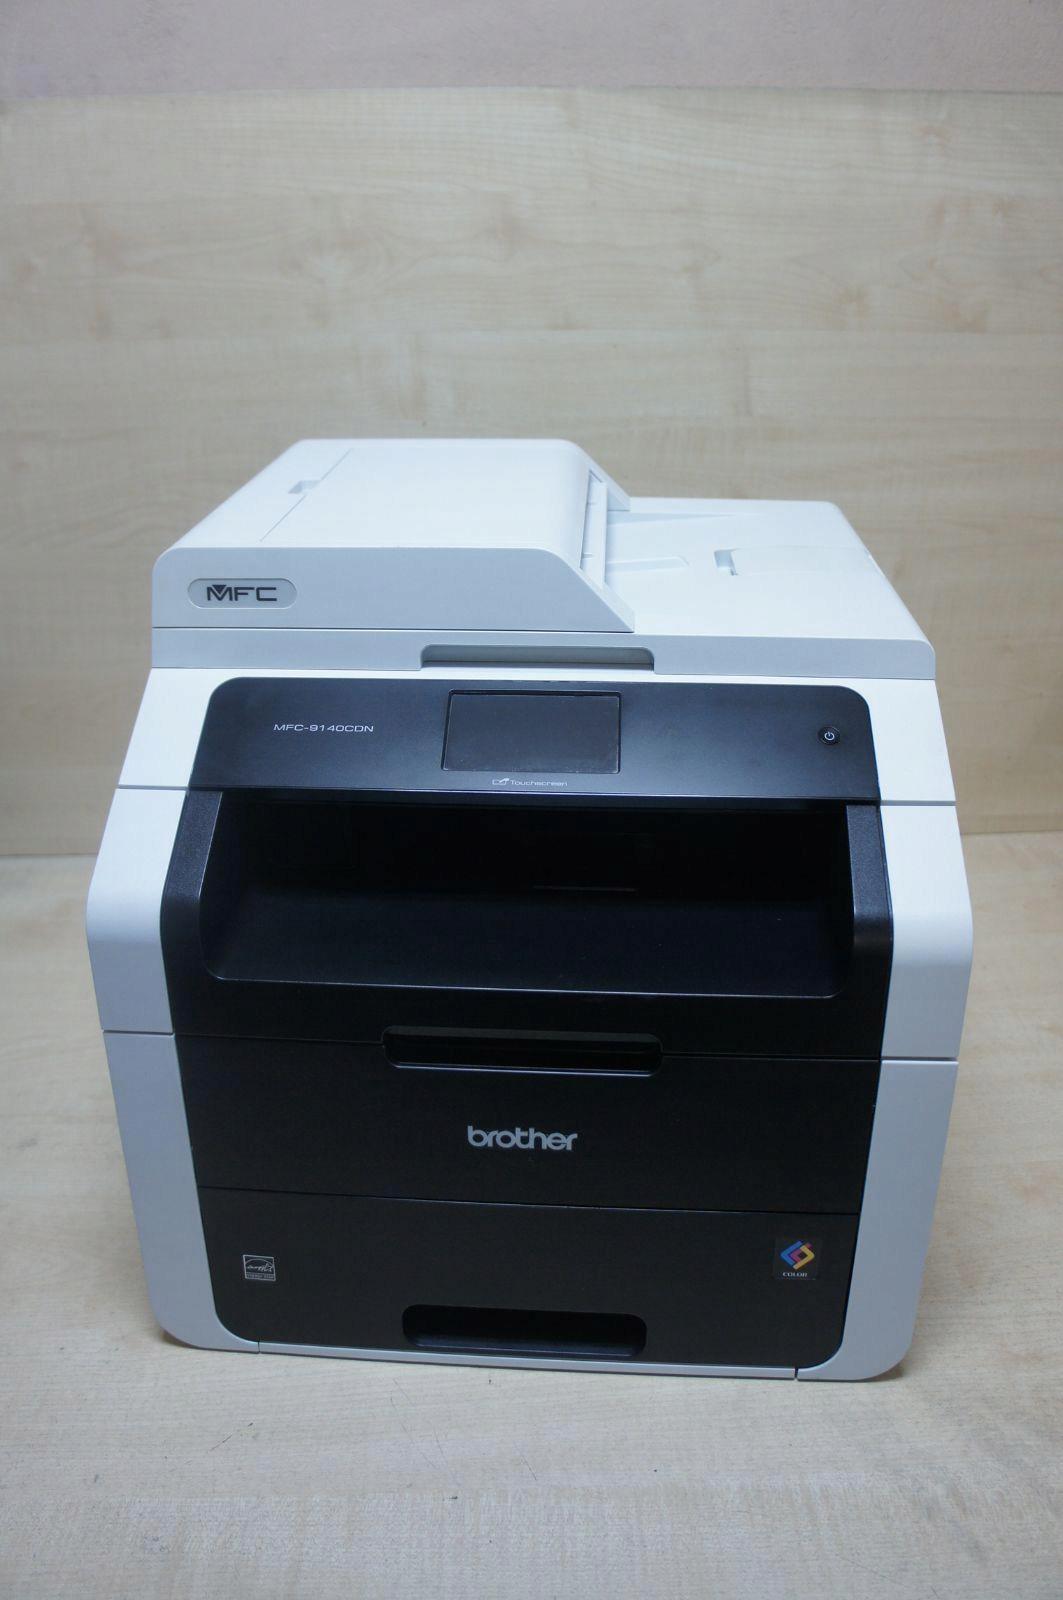 BROTHER MFC-9140CDN LAN DRIVER WINDOWS XP